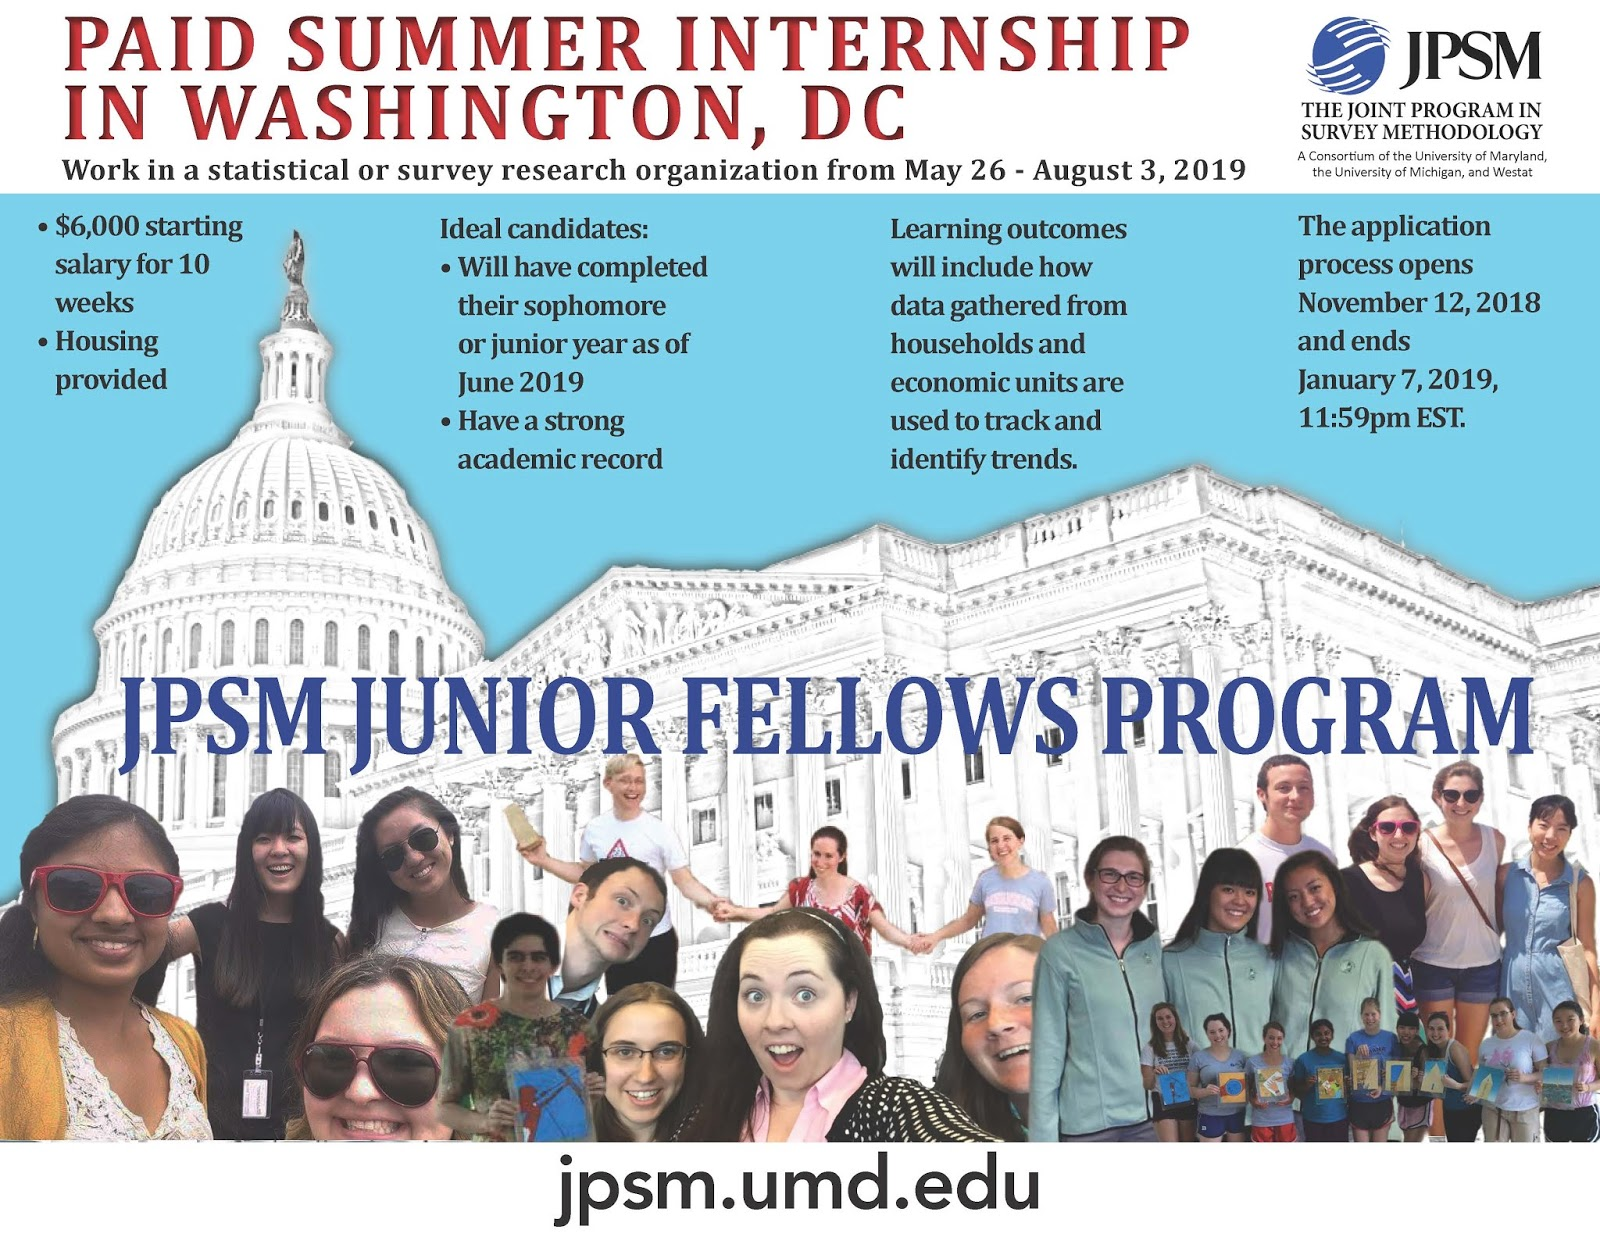 CCJS Undergrad Blog: Joint Program in Survey Methodology (JPSM) Paid